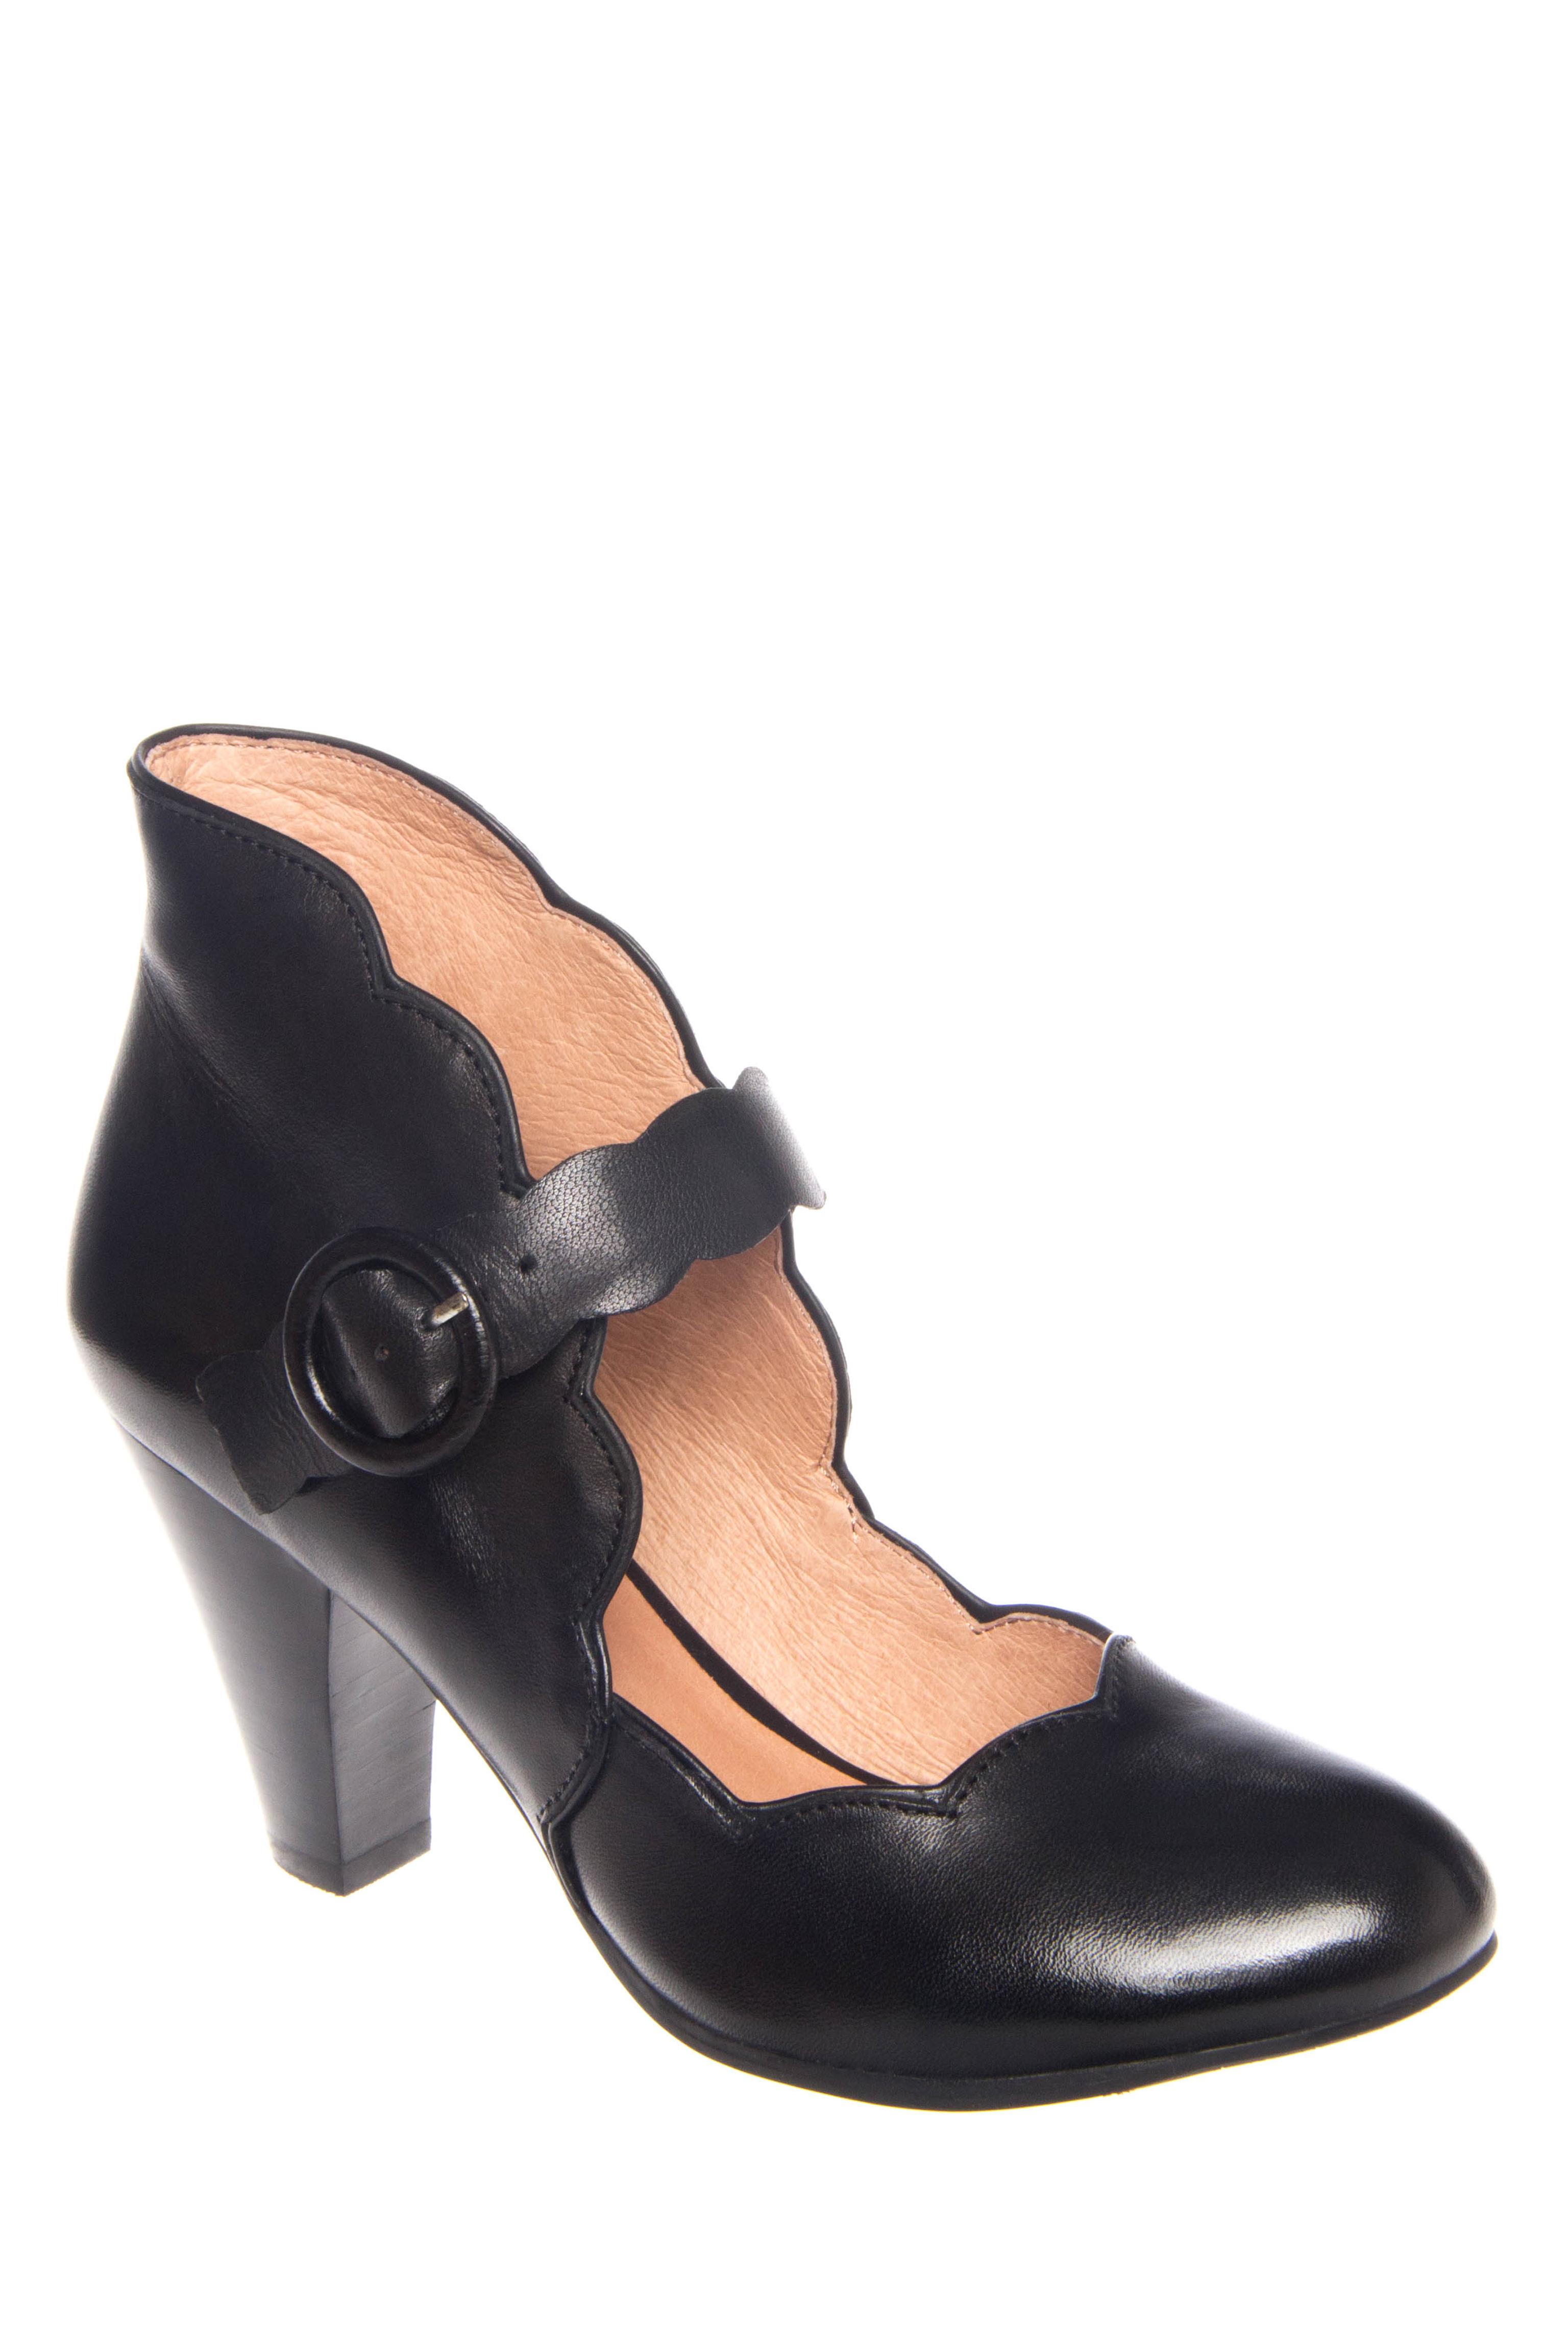 Miz Mooz Carissa Mid Heel Leather Pumps - Black